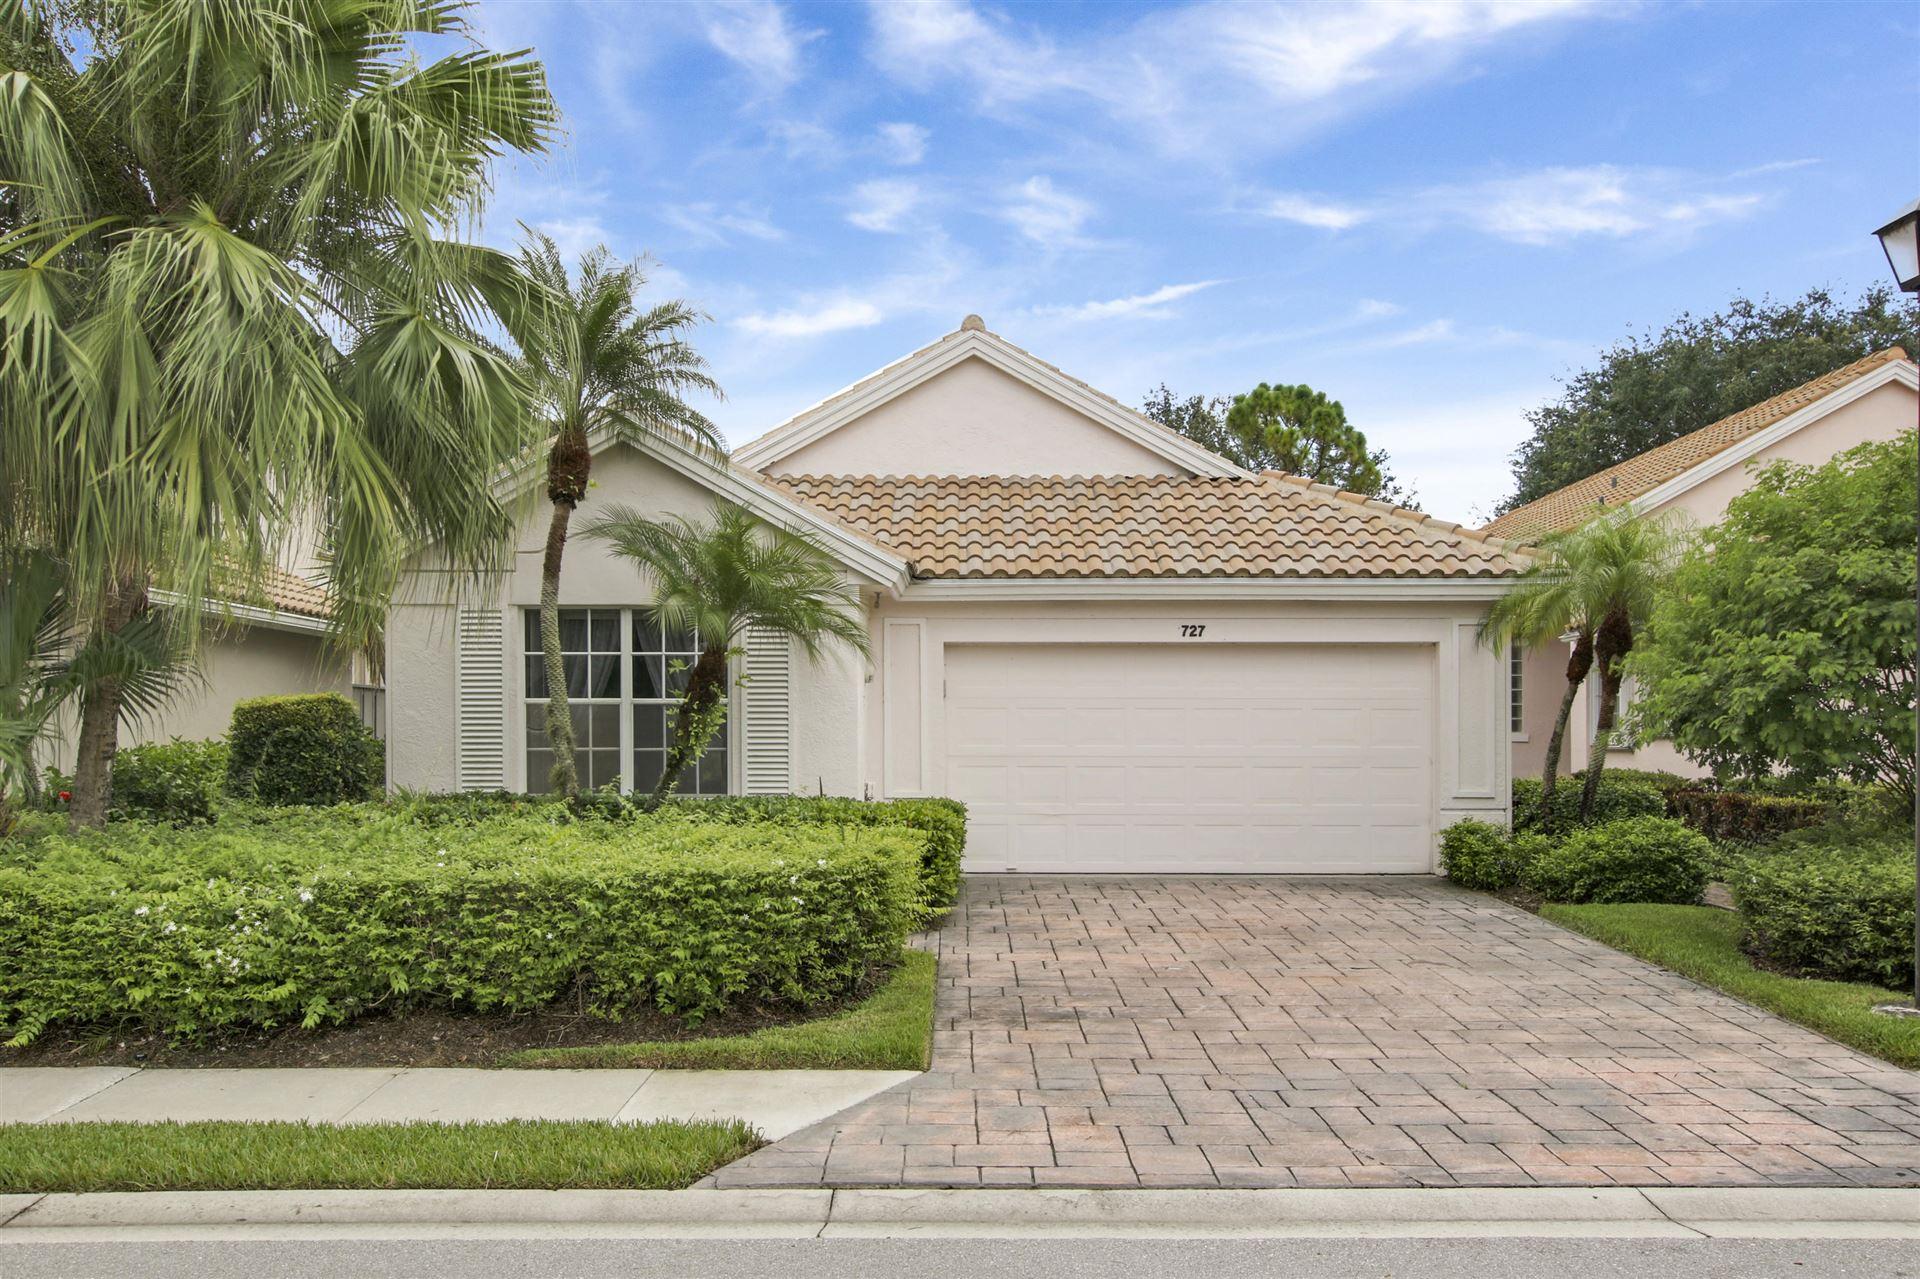 727 Pinehurst Way, Palm Beach Gardens, FL 33418 - #: RX-10631864